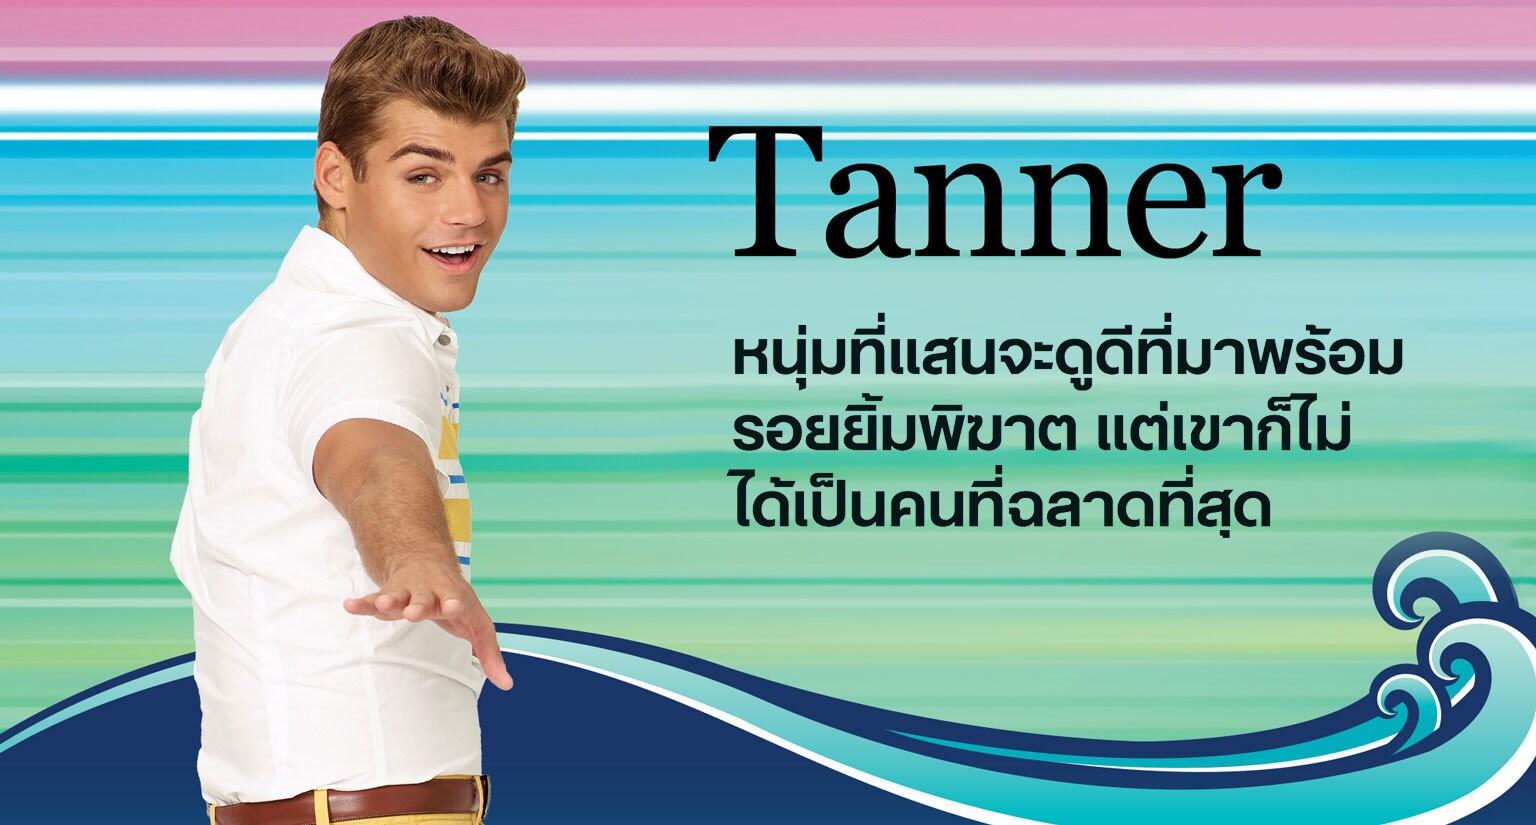 Teen Beach 2 - Show Home - Tanner Character Hero - TH